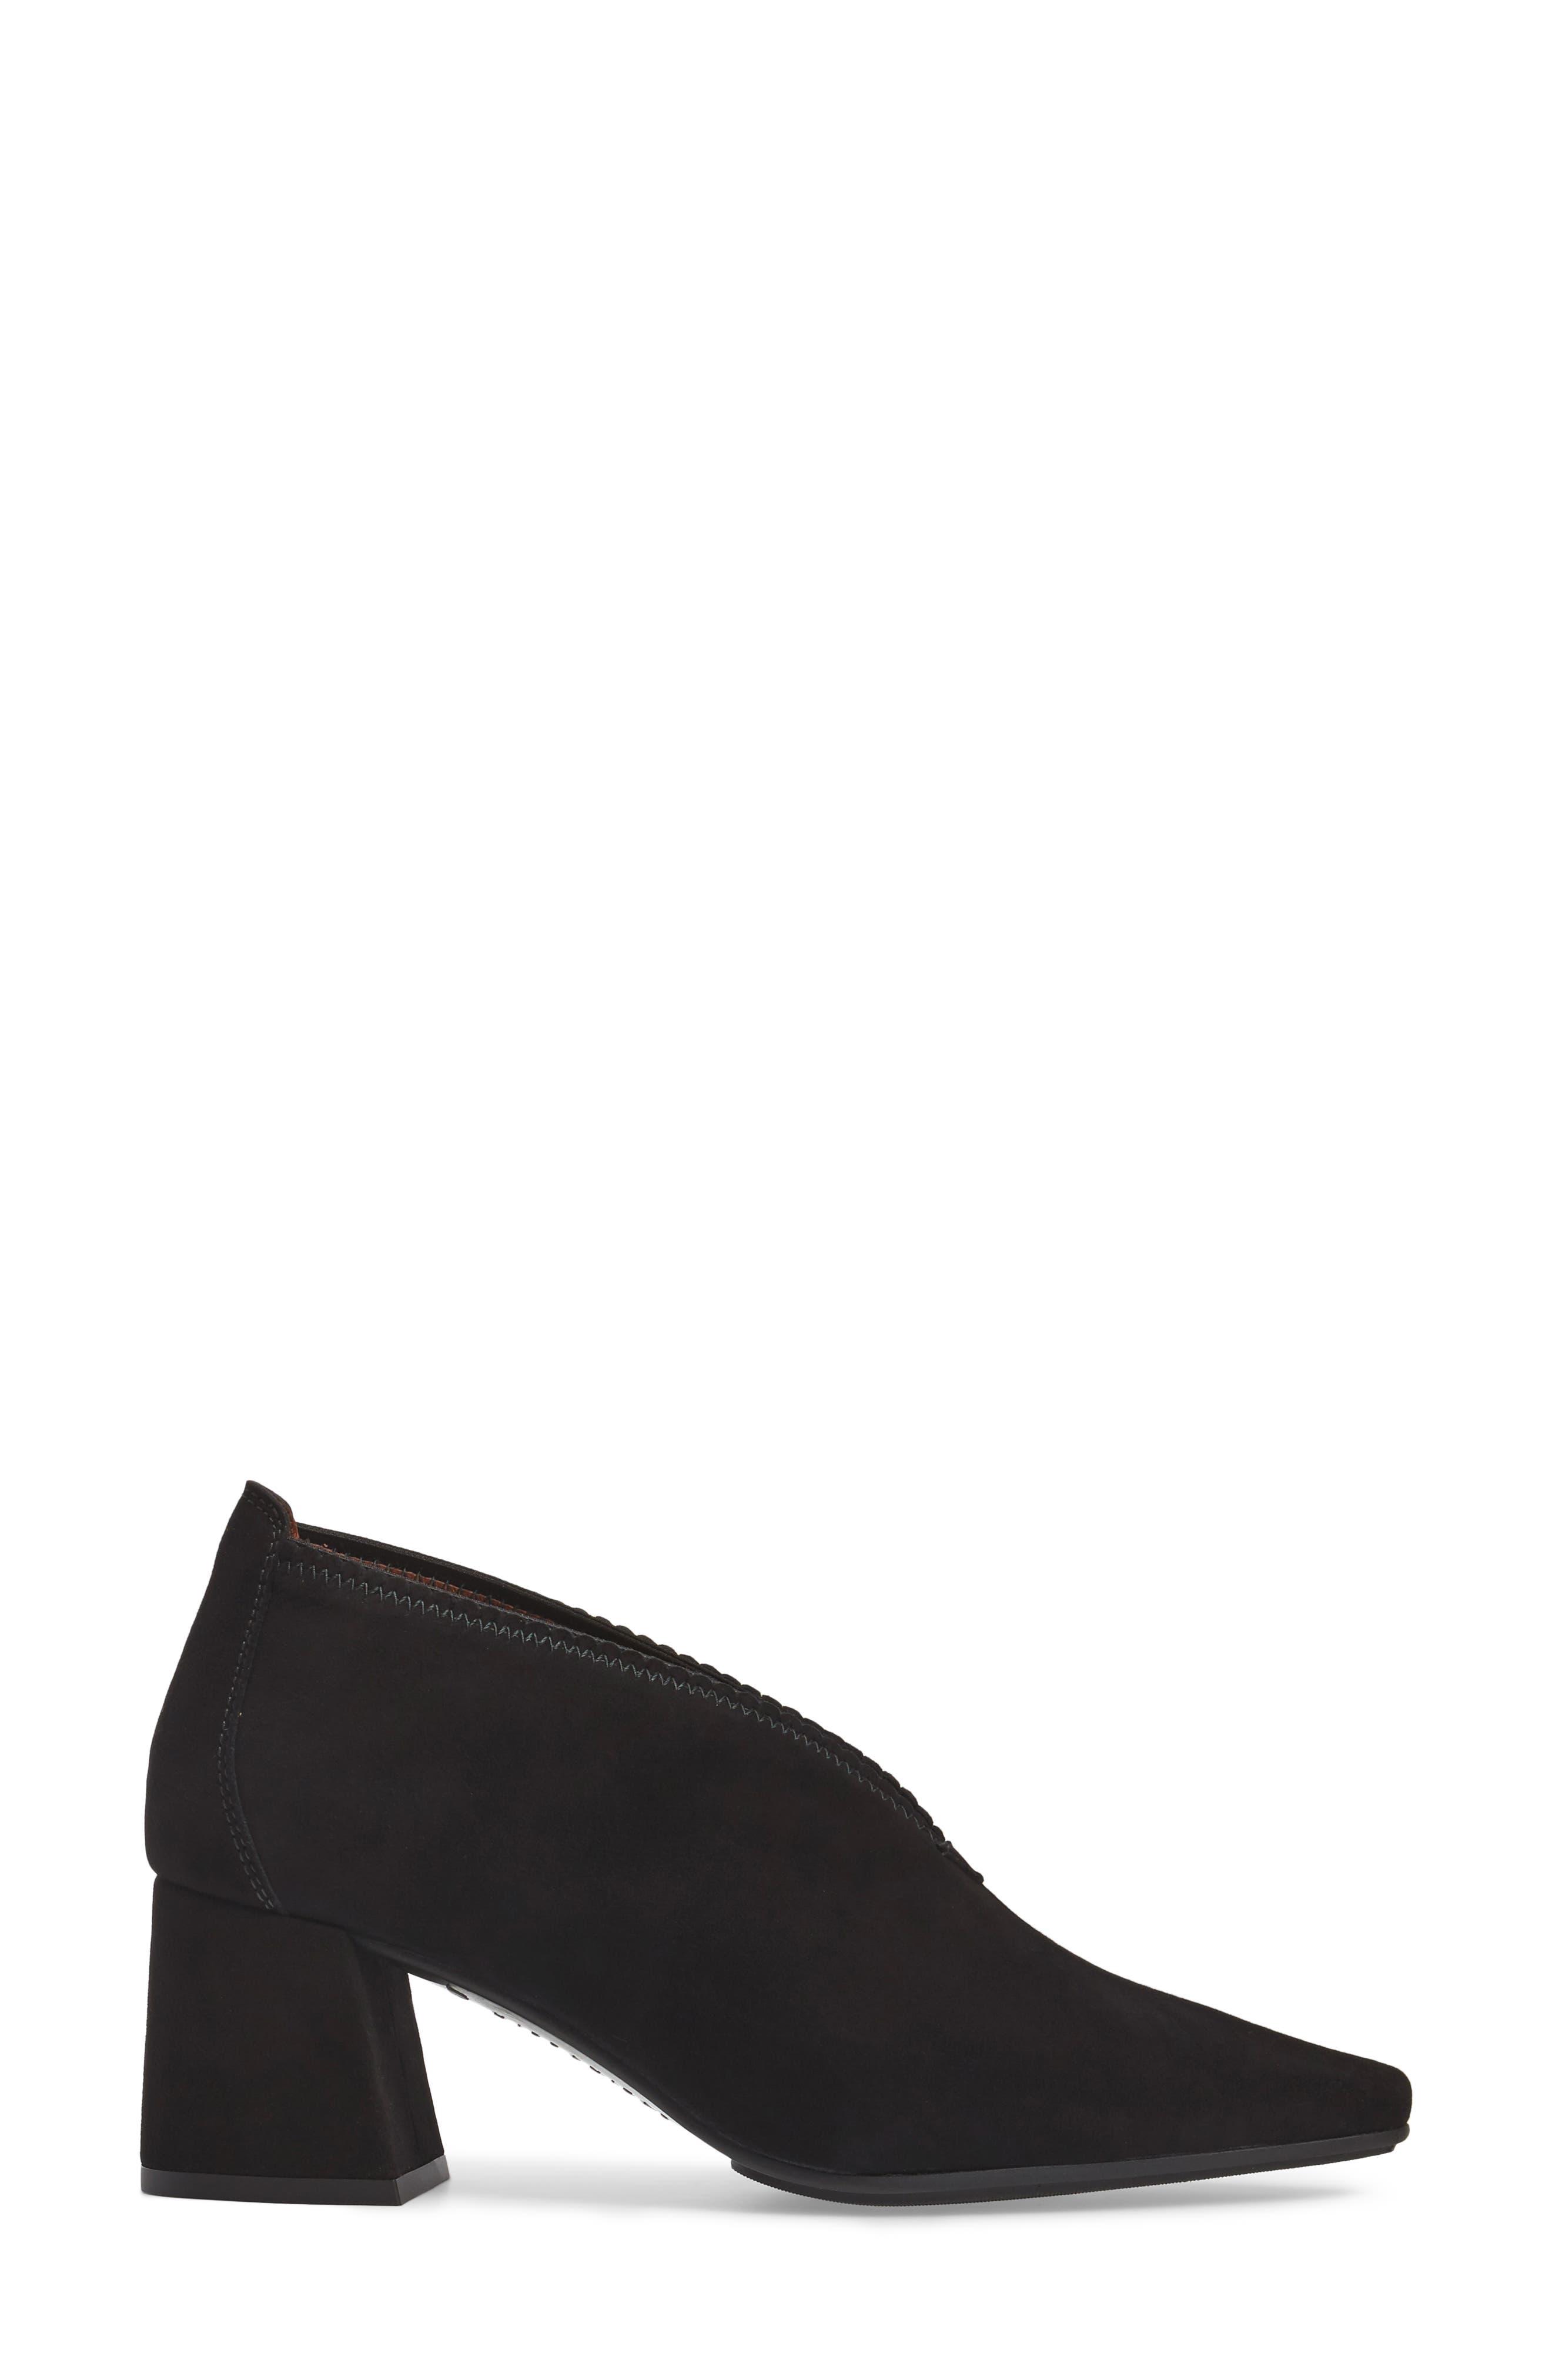 Connie Block Heel Pump,                             Alternate thumbnail 3, color,                             Ante Black Leather